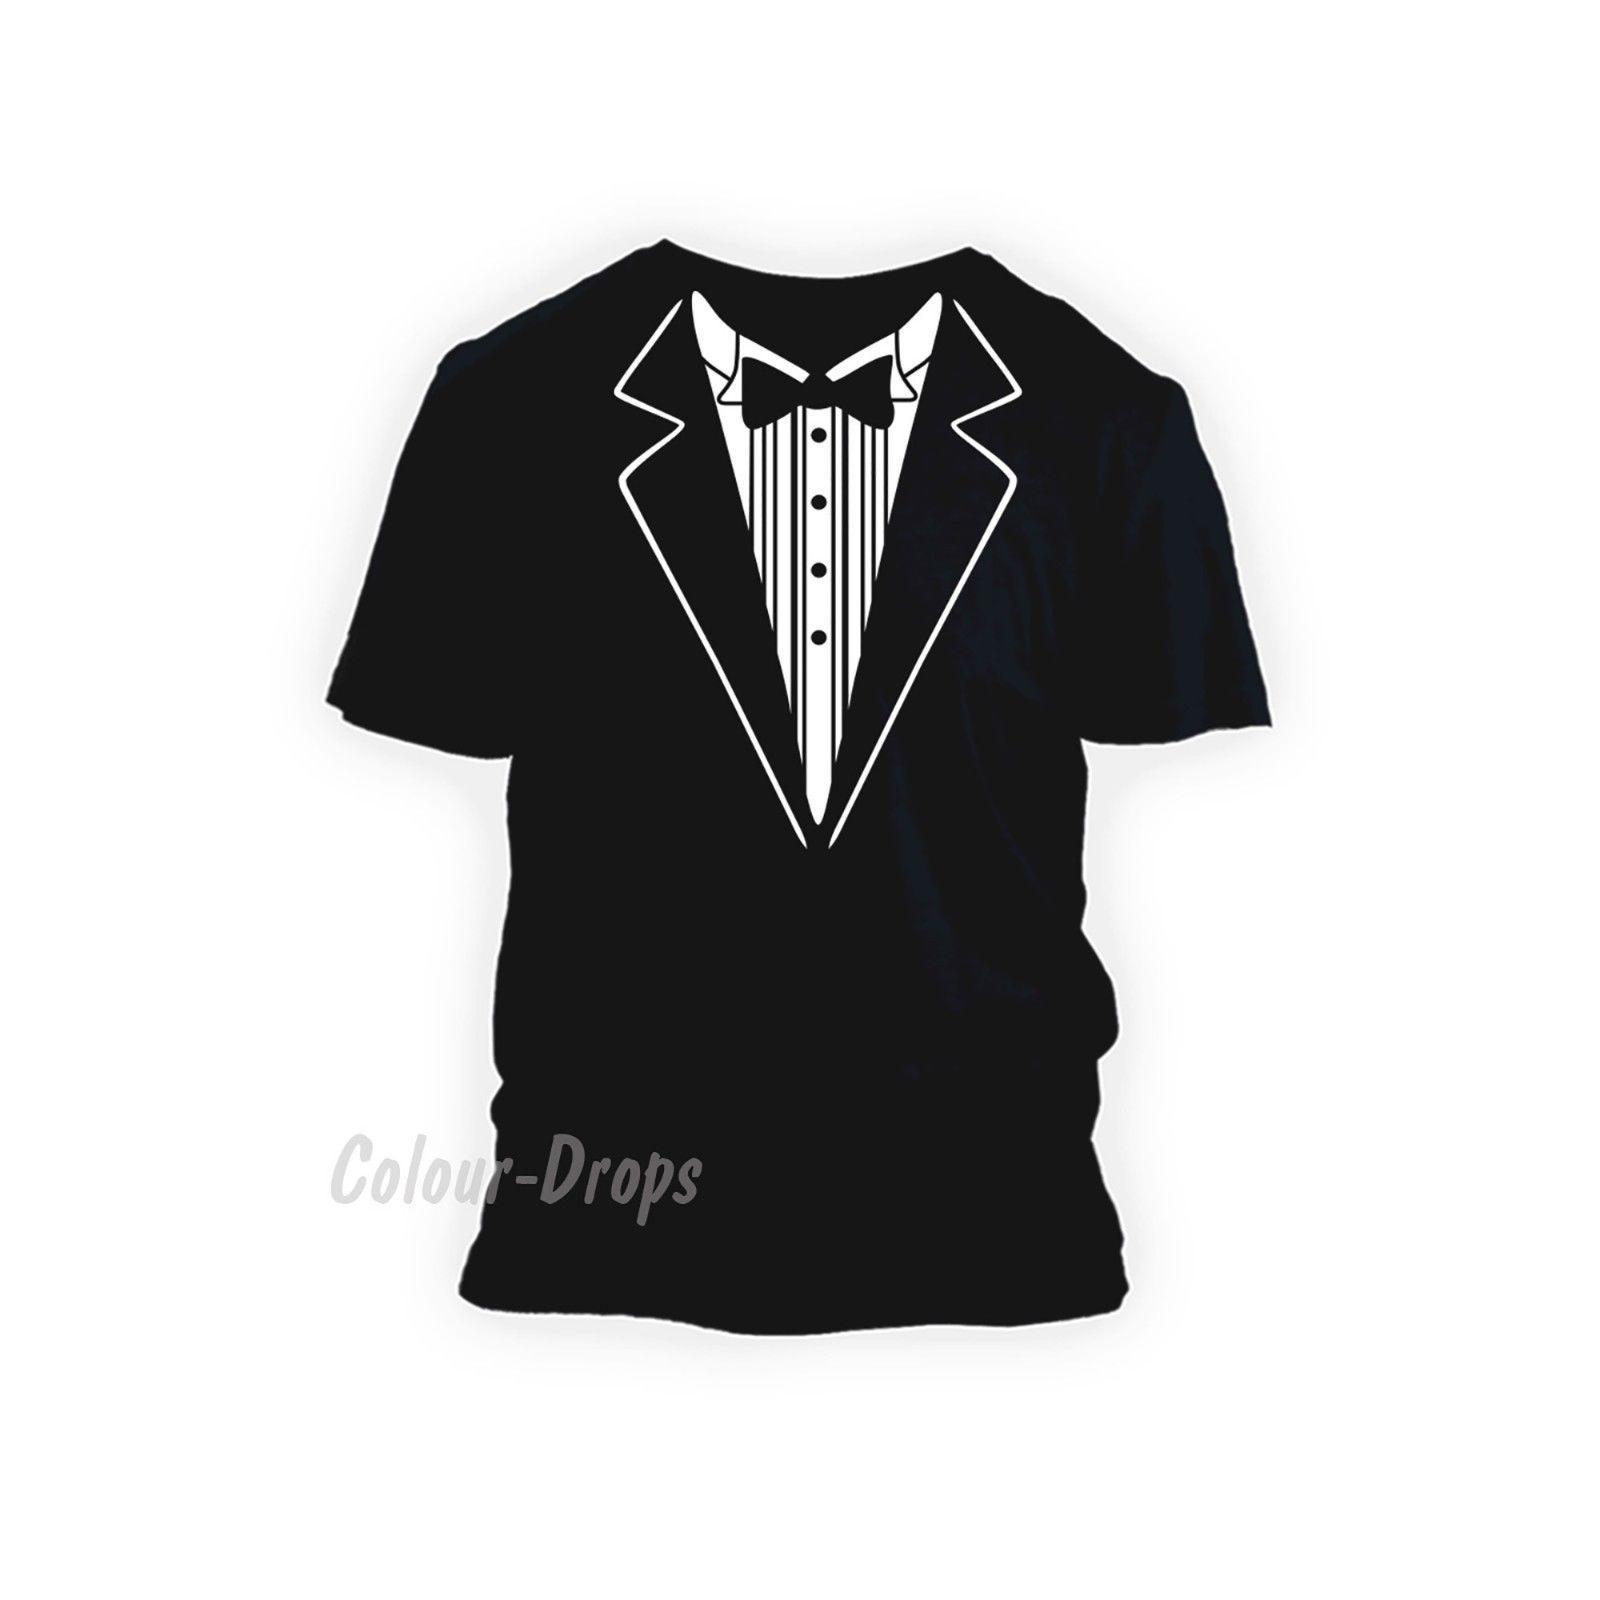 Details zu Tuxedo Suit Bow Tie Funny Fancy Dress Formal wedding Men's Ladies kids T-shirts Funny free shipping Unisex tee